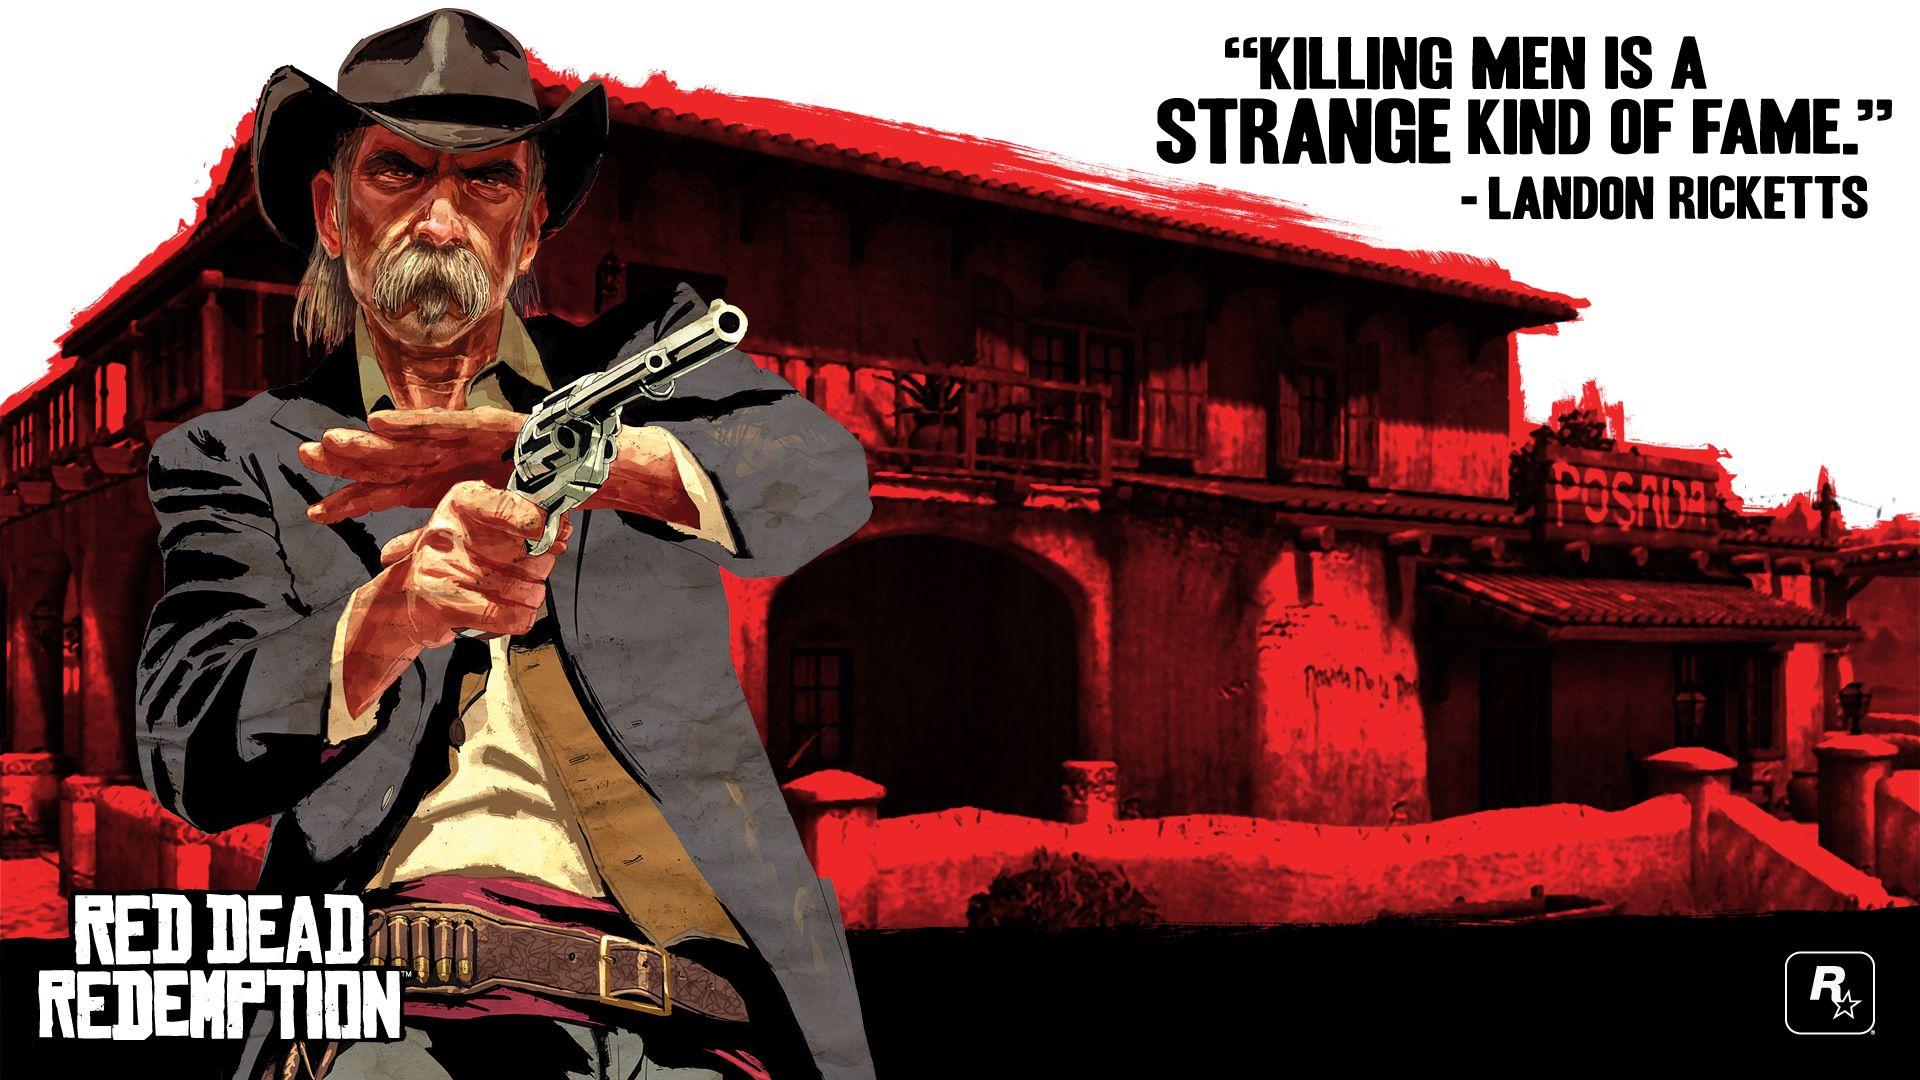 Red Dead Redemption Red Dead Redemption Wallpaper 6 Jeux